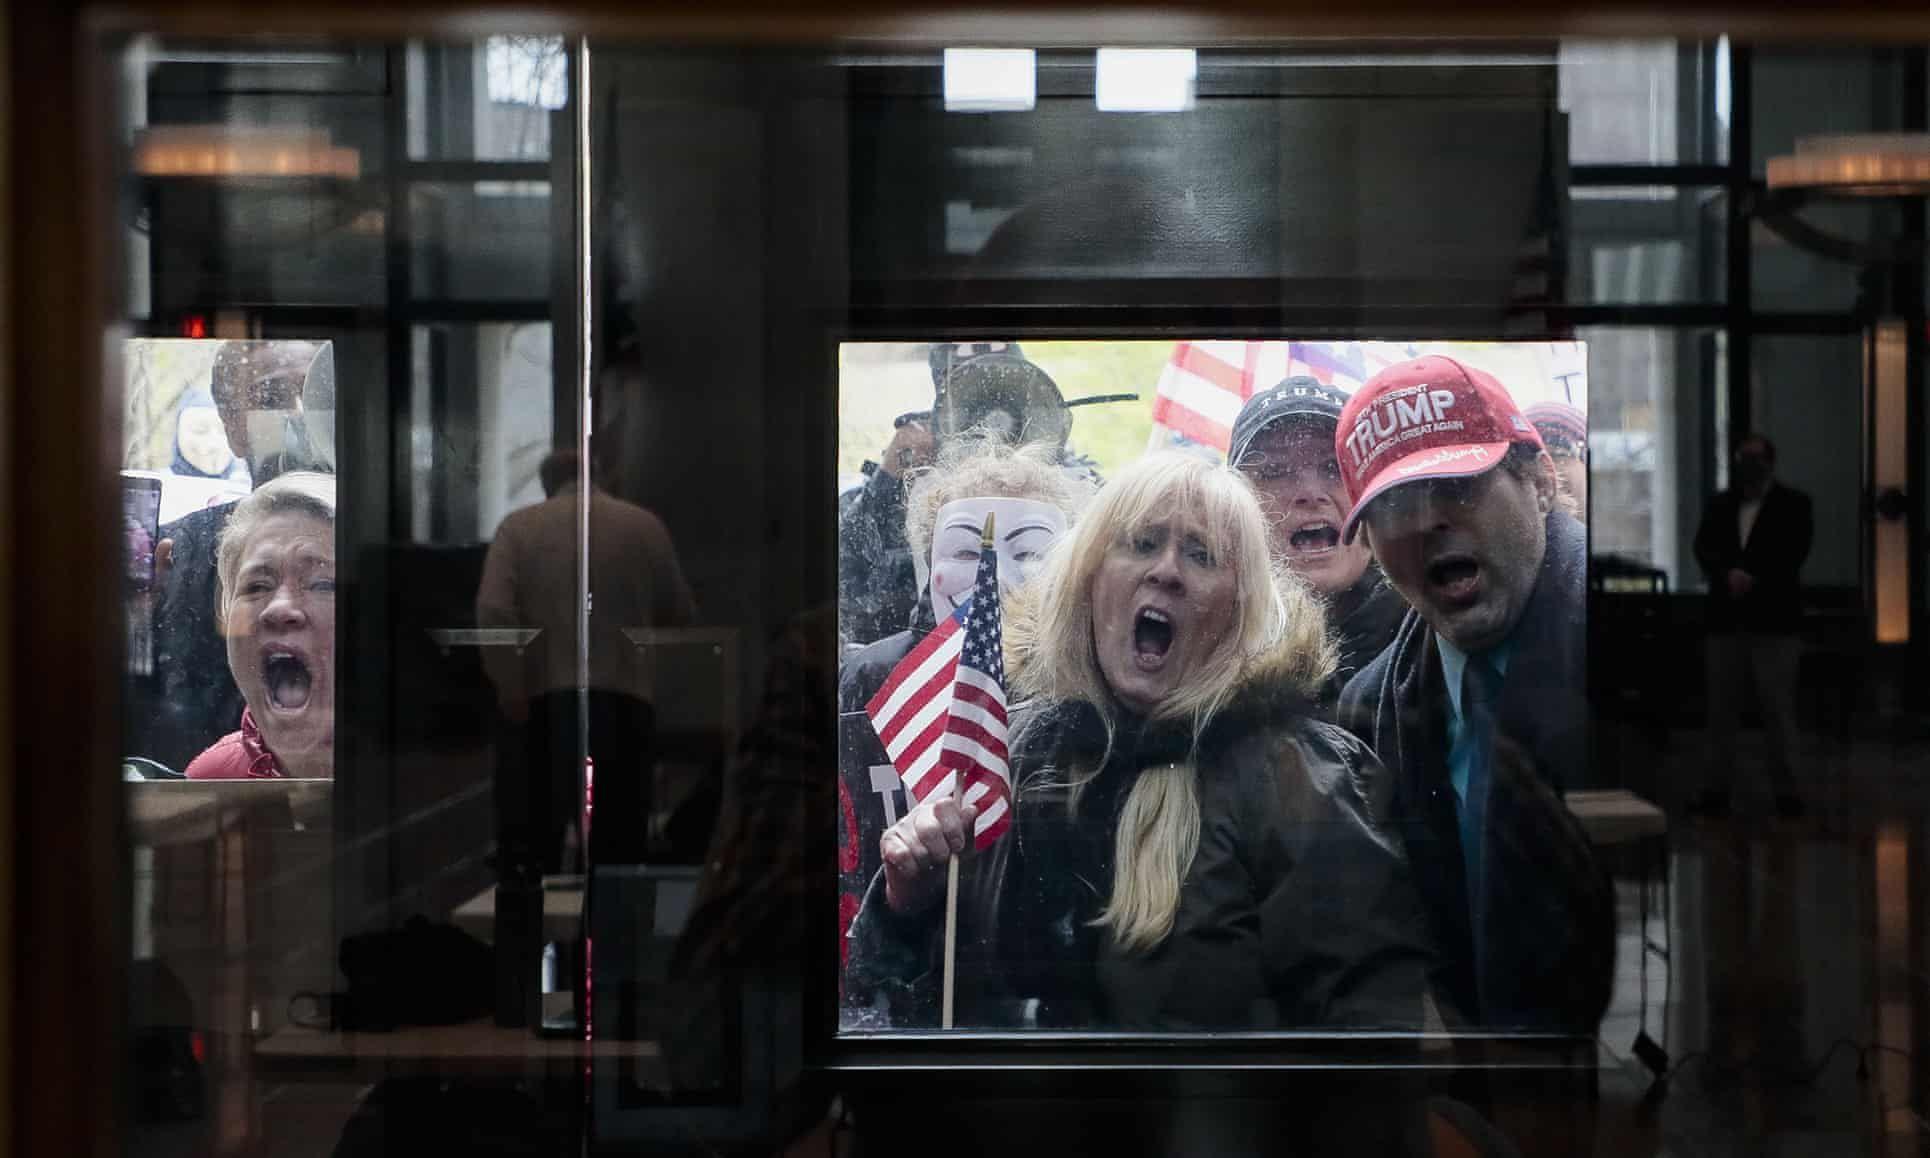 Fury and despair behind the viral image of Americans